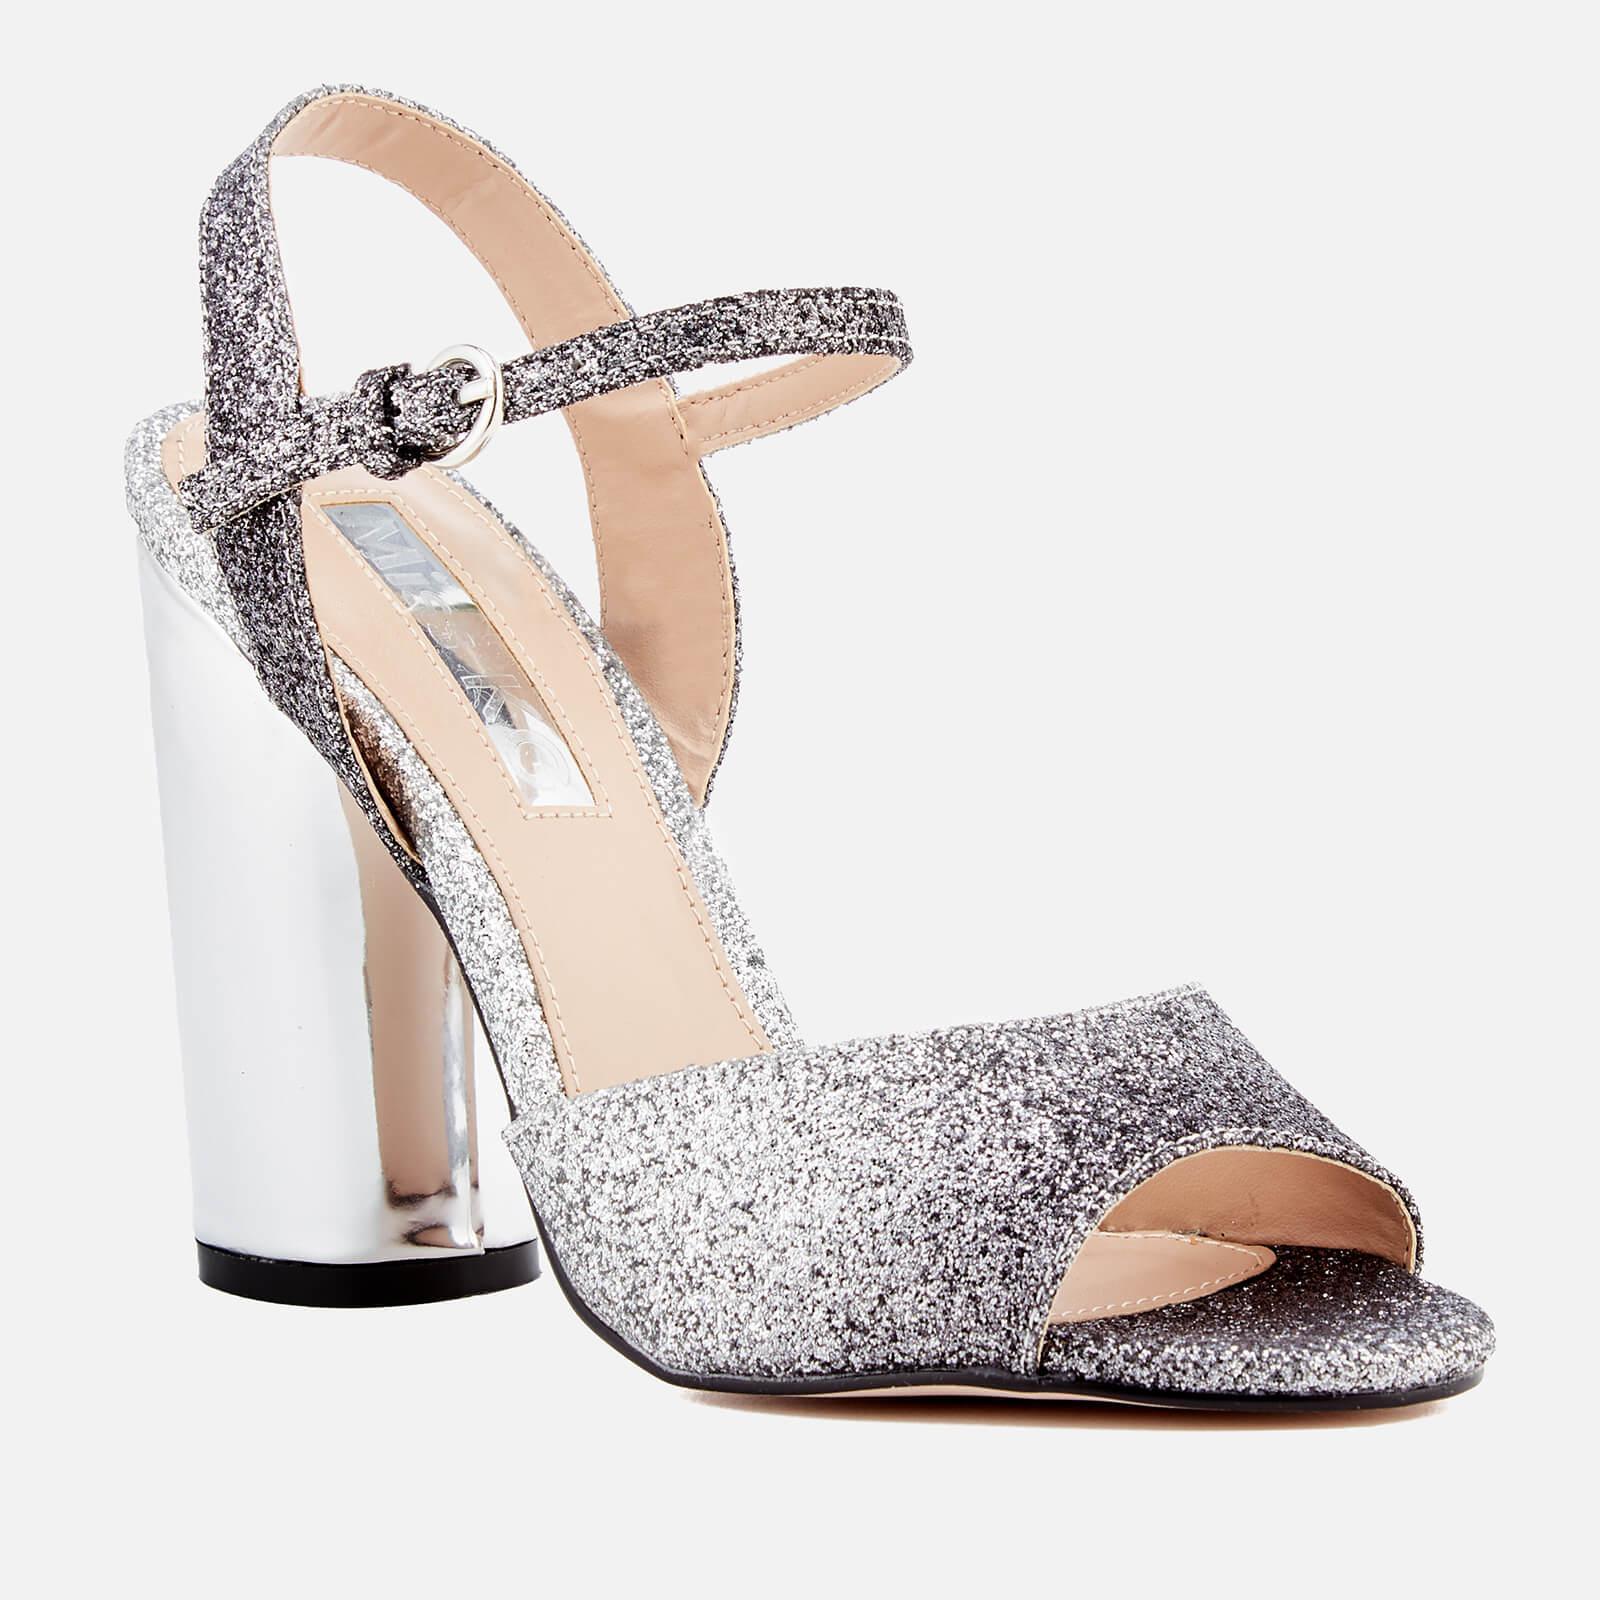 Miss Kg Strappy Sandal in Silver (Metallic) - Lyst